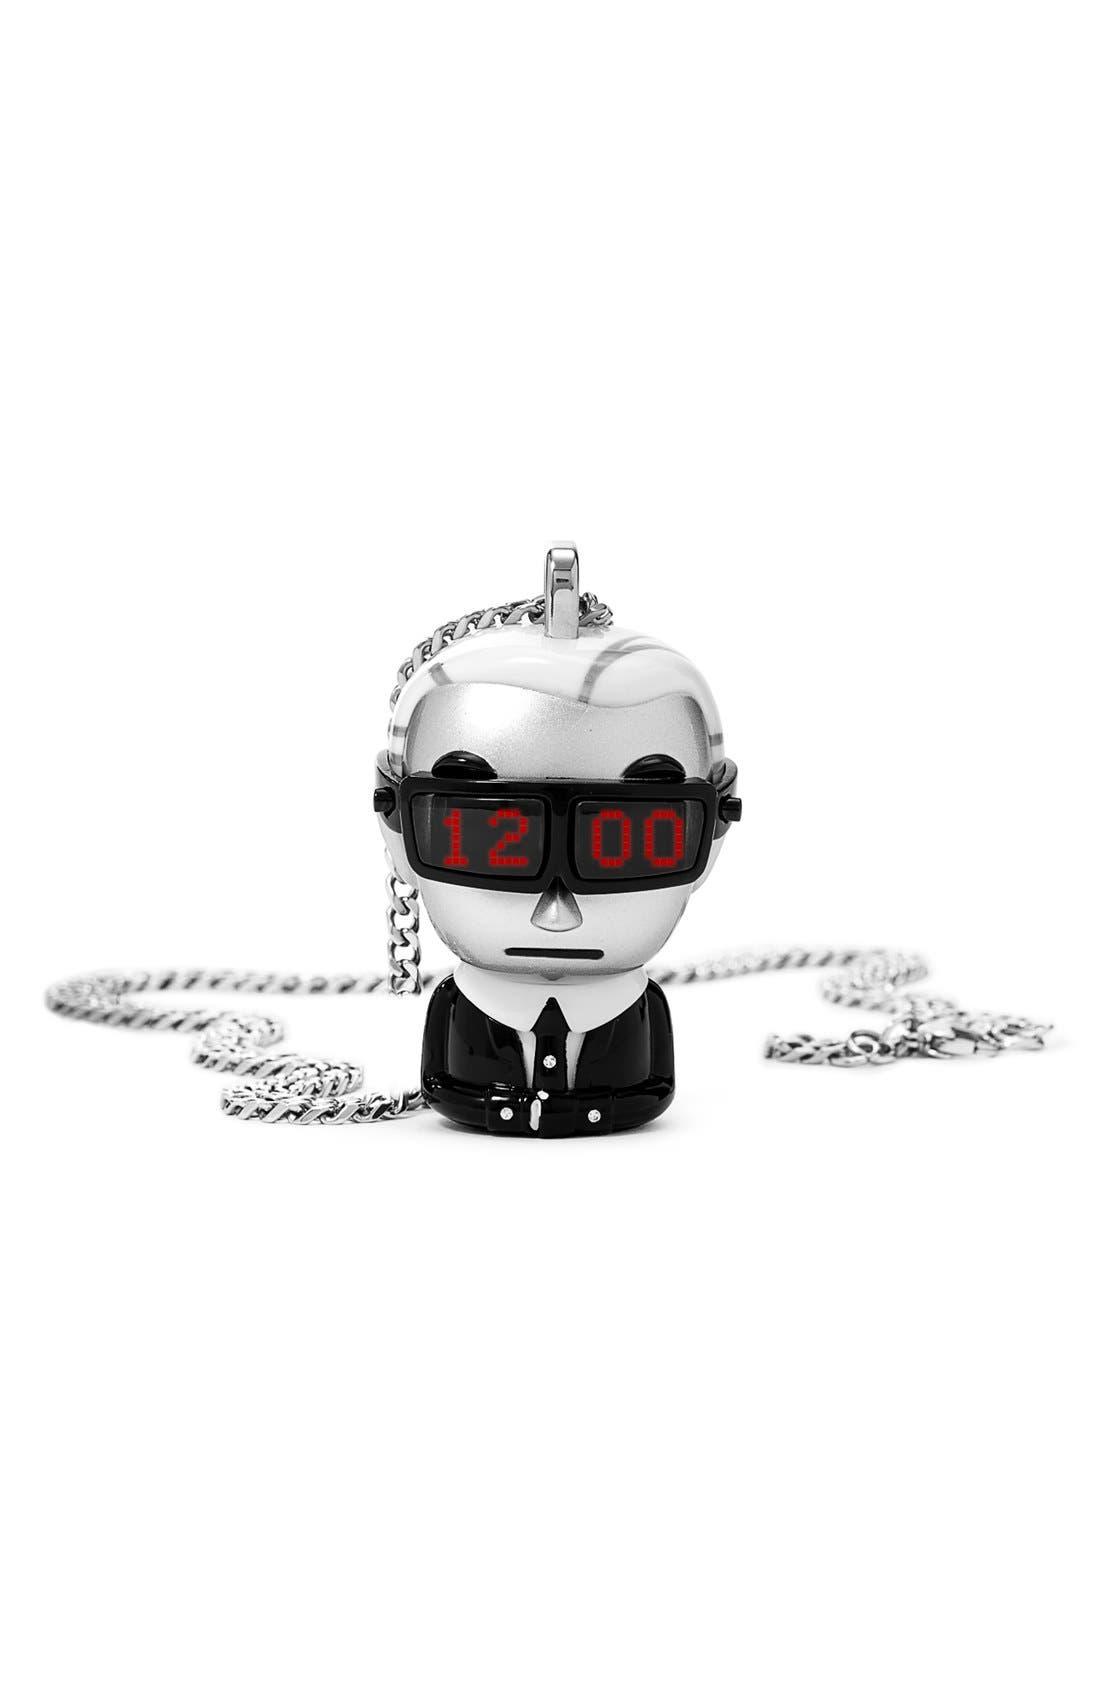 'tokidoki' Digital Necklace Watch, 37mm x 51mm,                             Alternate thumbnail 6, color,                             Silver/ Black/ White